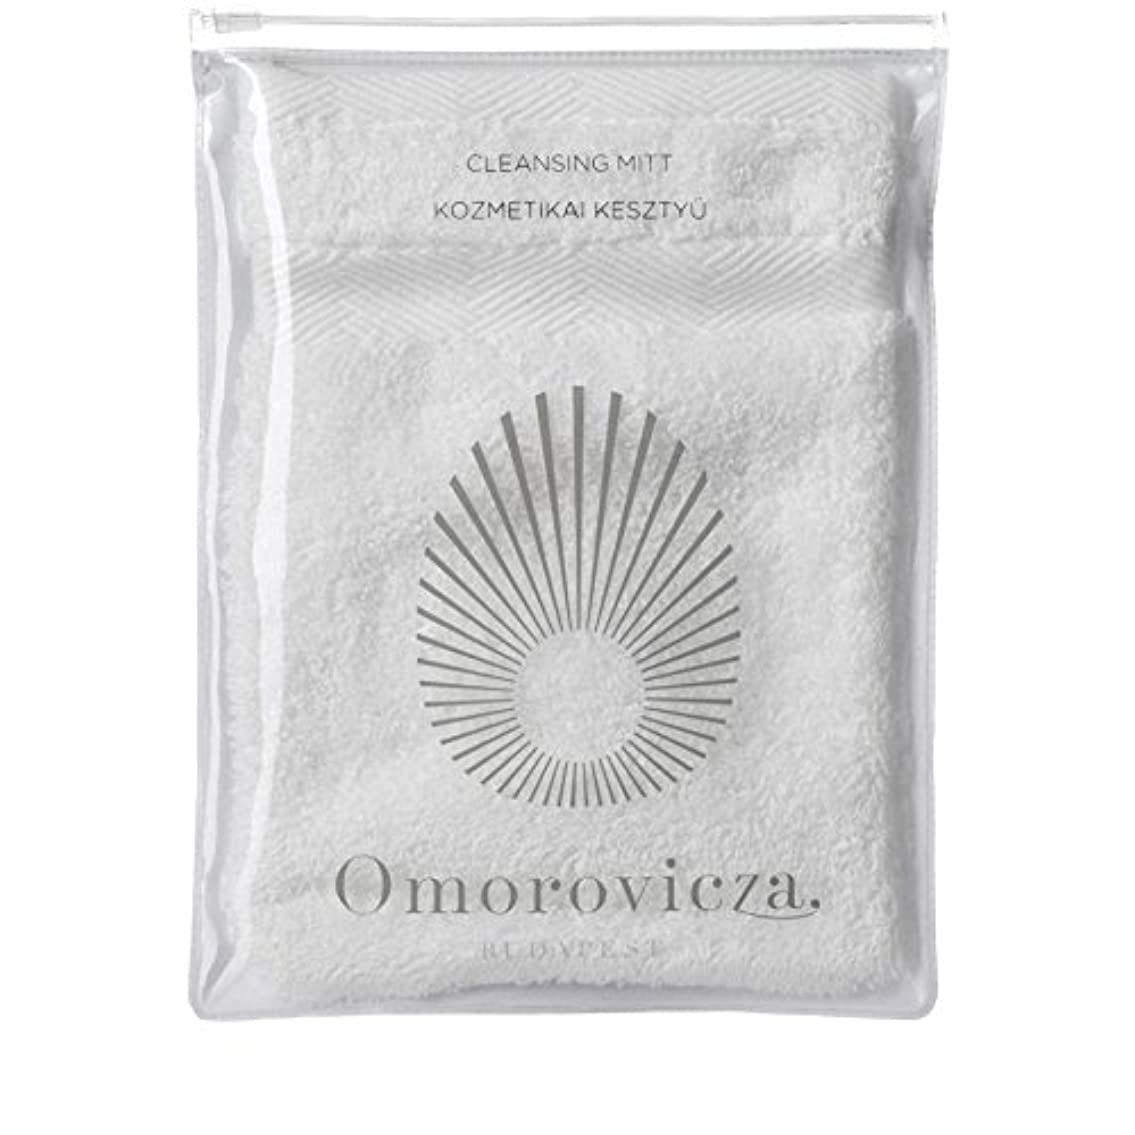 Omorovicza Cleansing Facial Mitt, Omorovicza (Pack of 6) - クレンジング顔のミット、 x6 [並行輸入品]